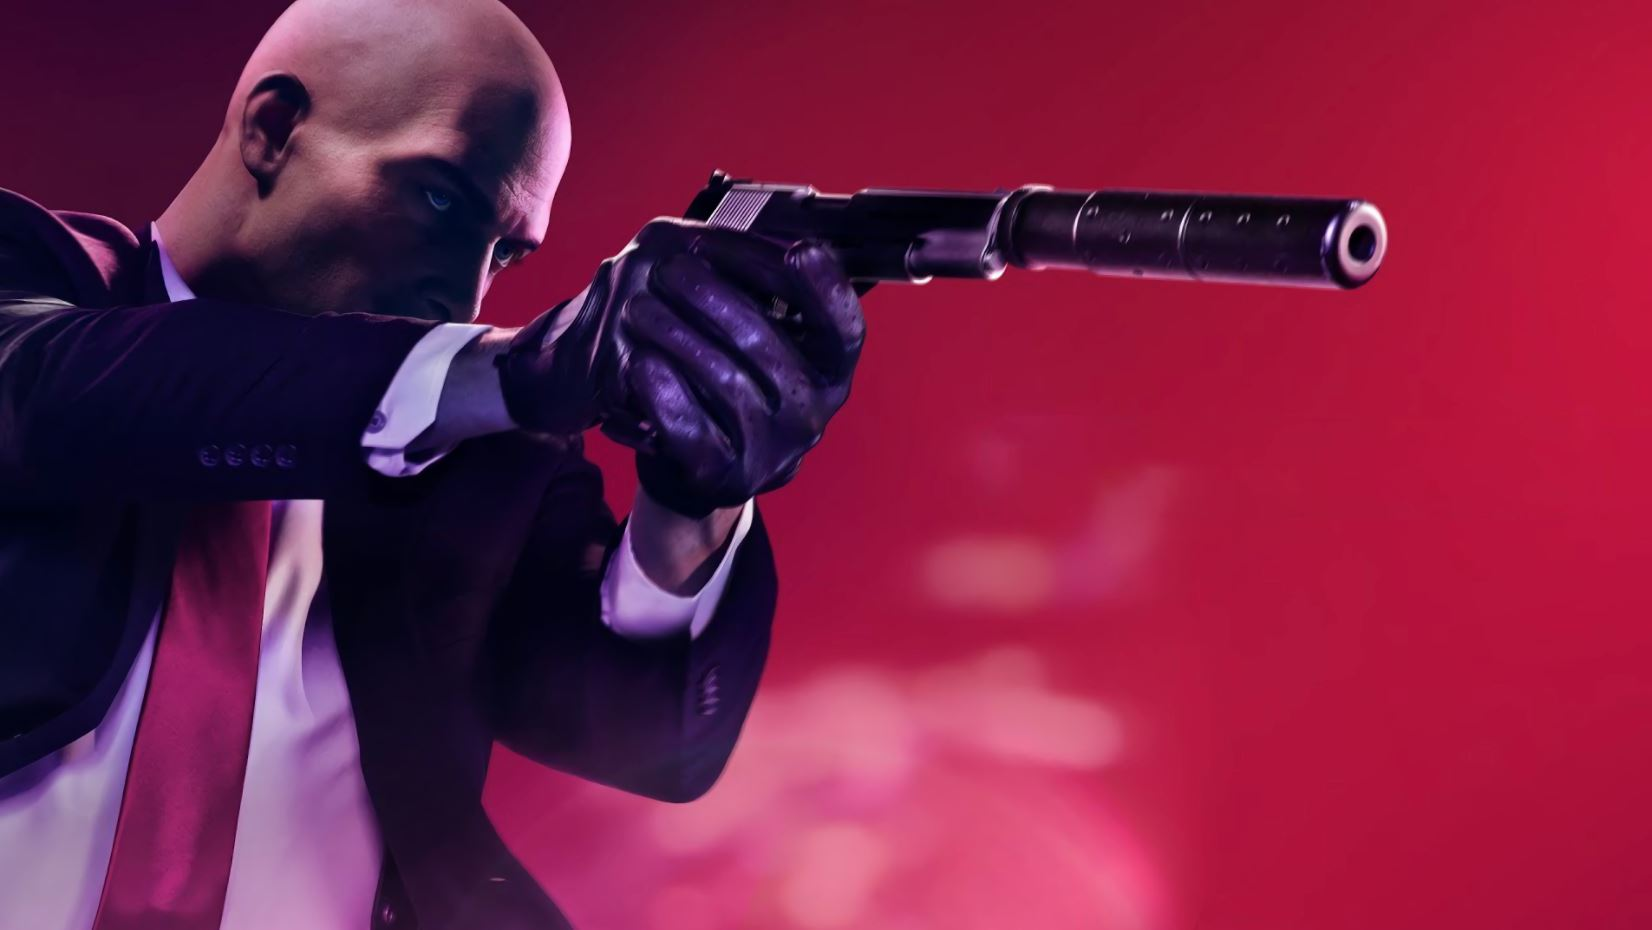 Hitman devs IO Interactive will soon reveal a new project